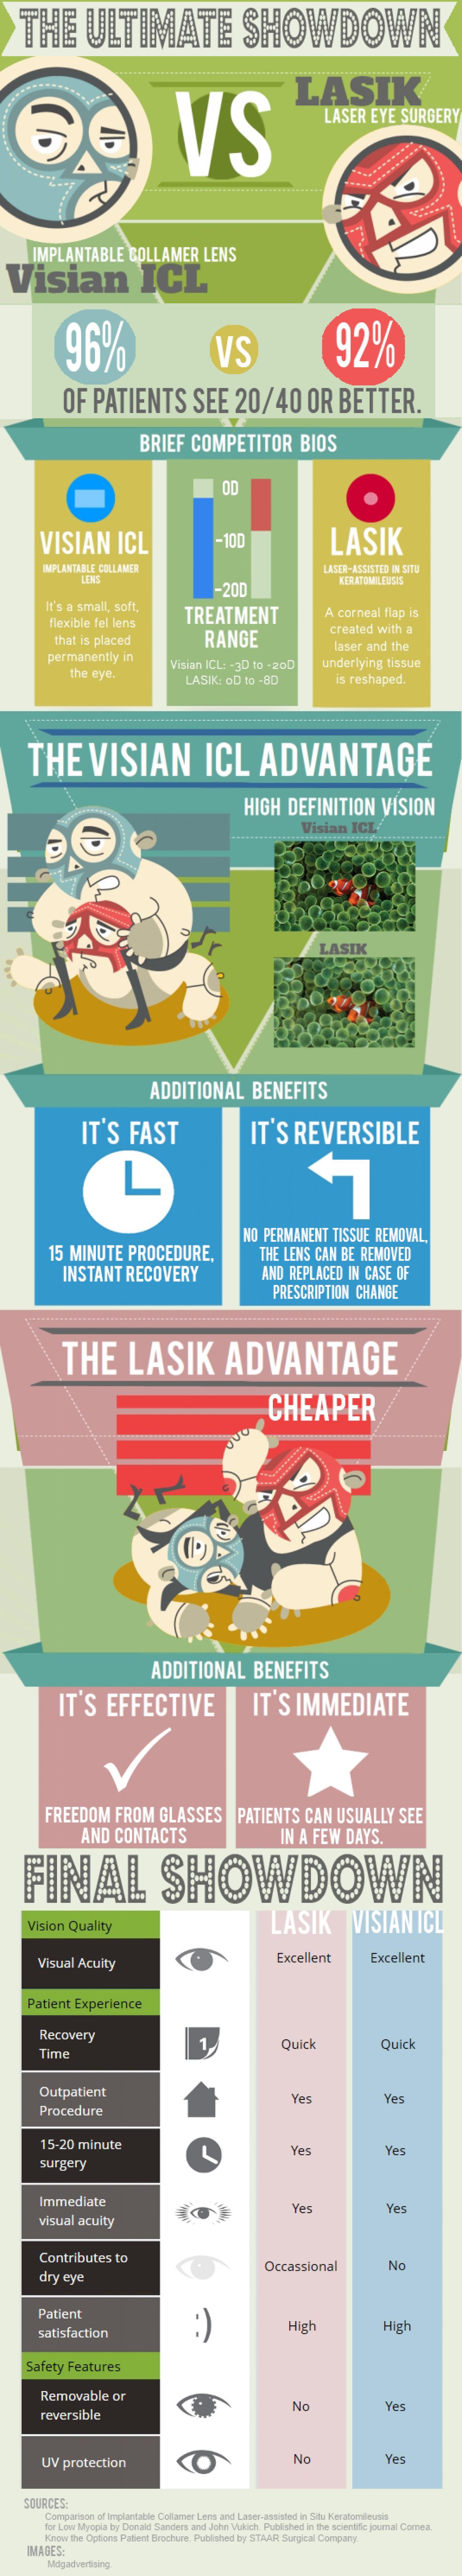 LASIK vs. Visian ICL: The Ultimate Showdown